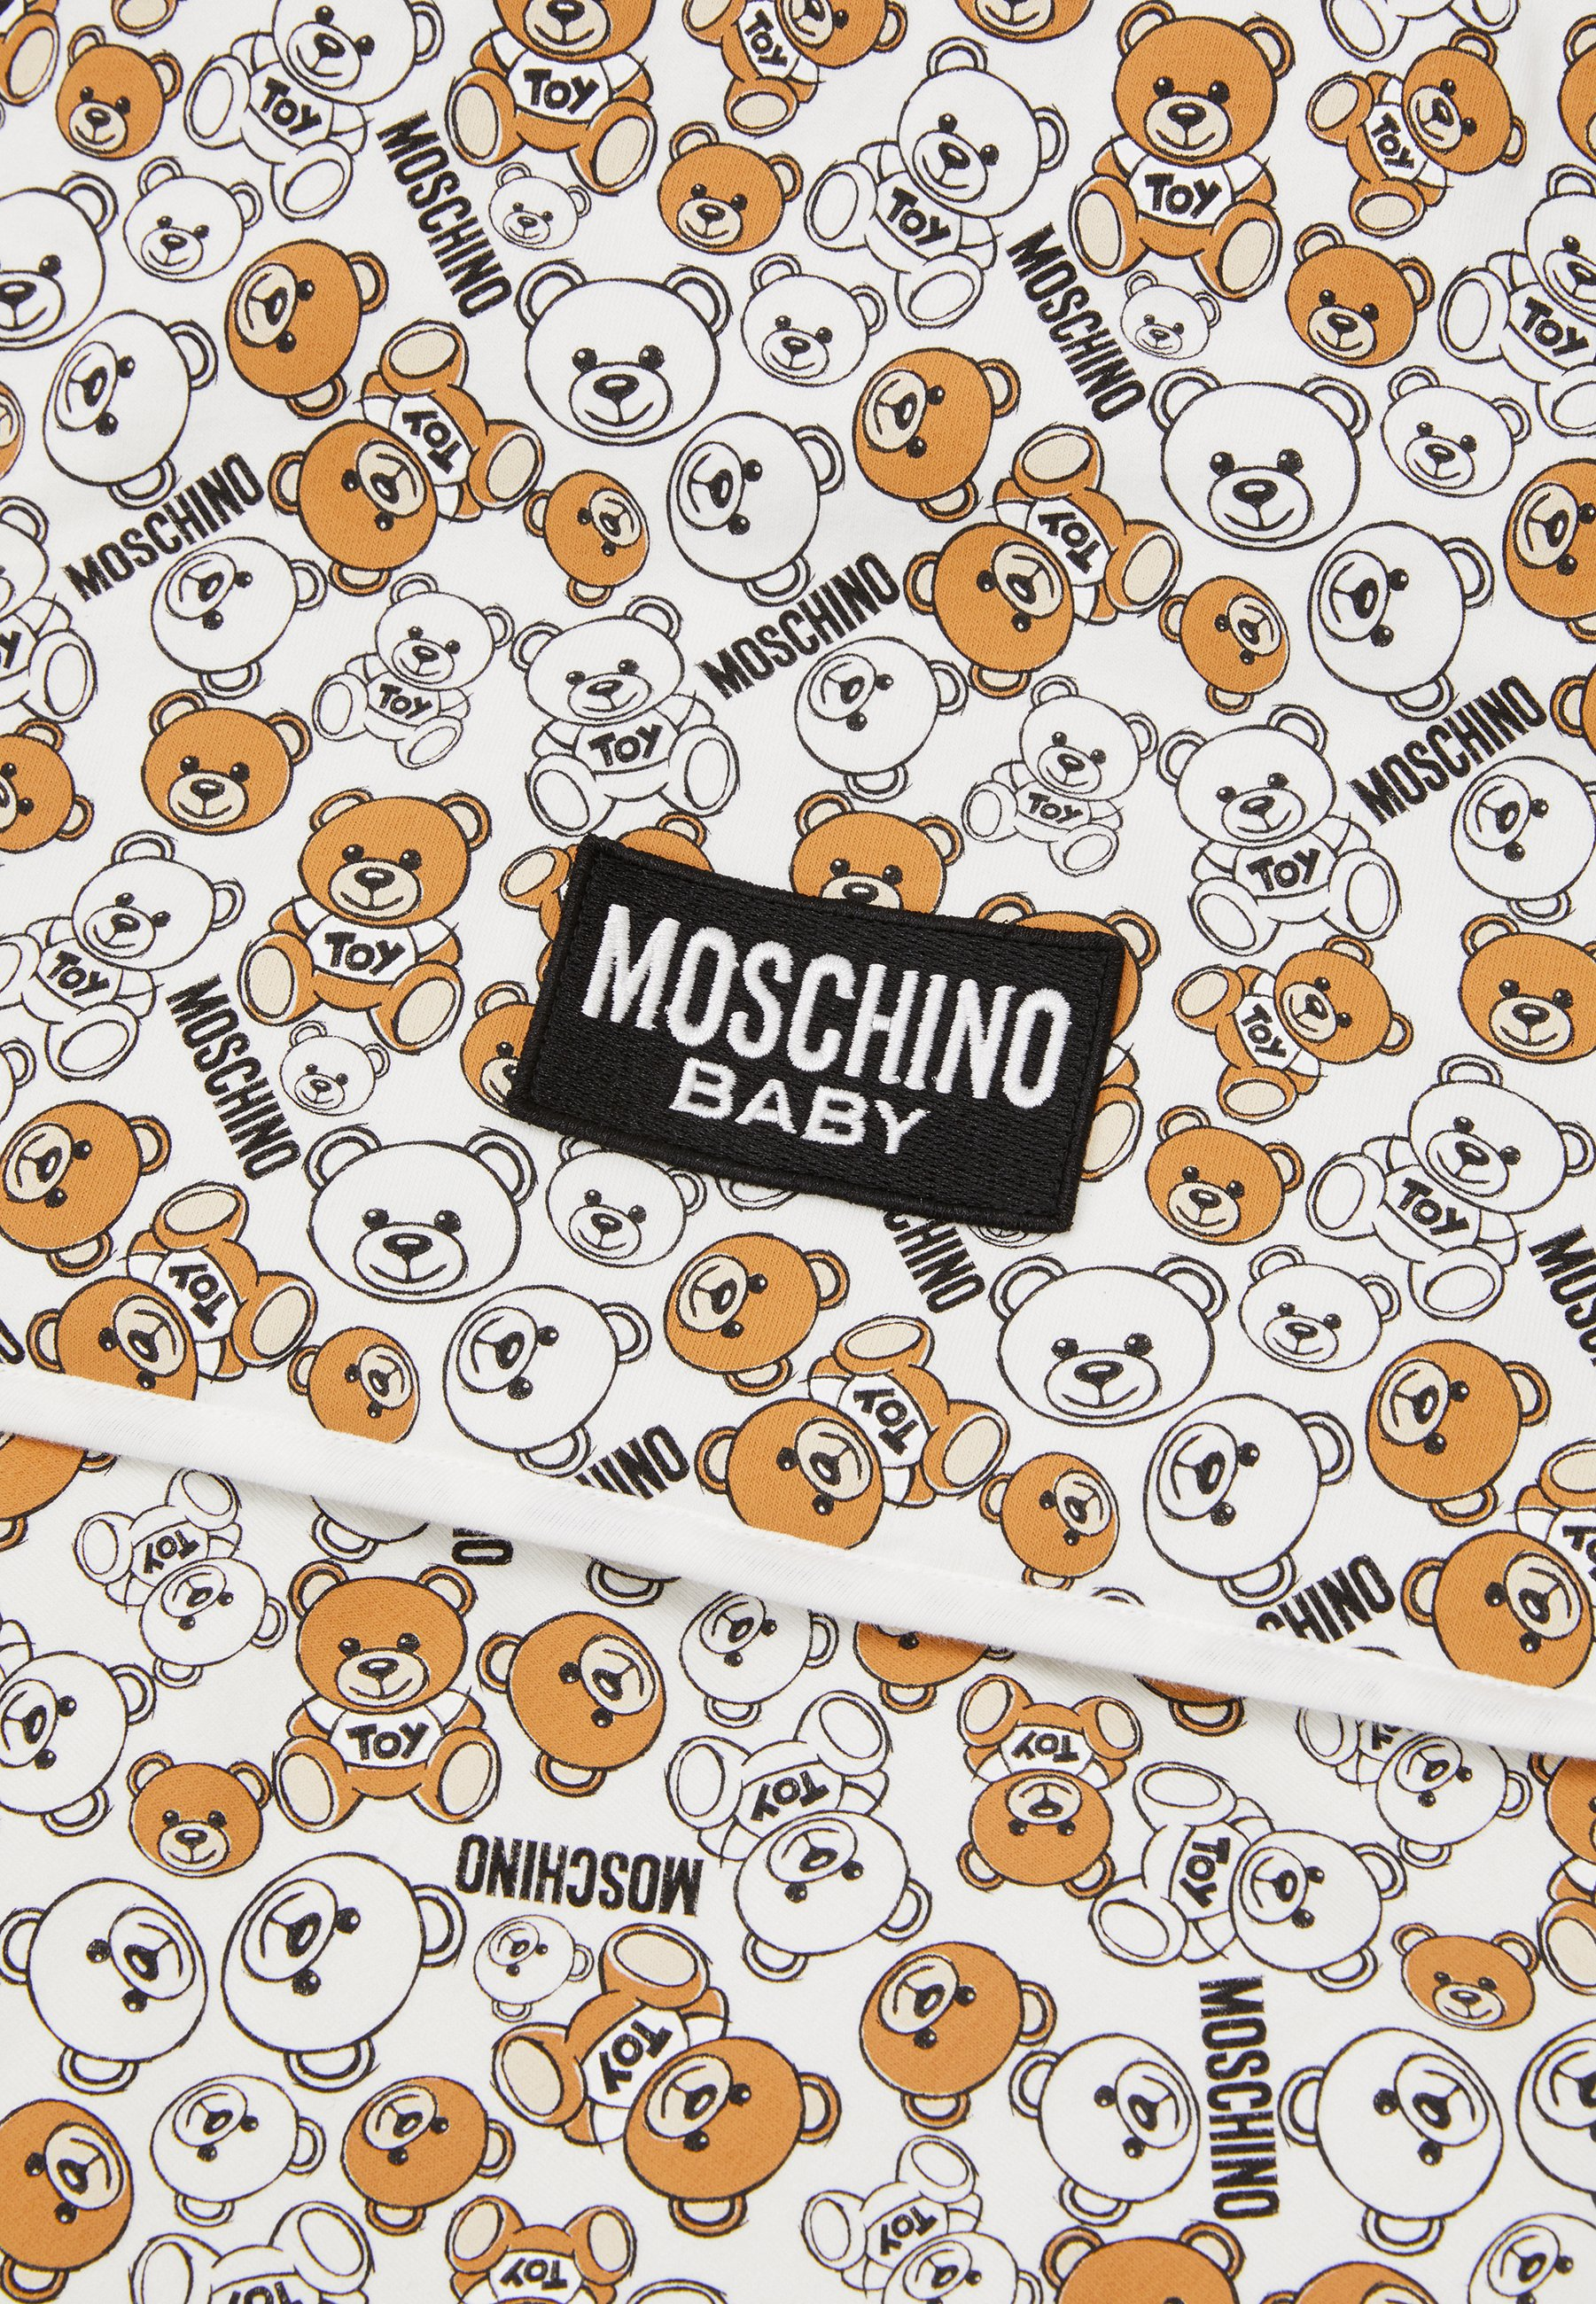 MOSCHINO BABY CHANGING BAG - Stelleveske - white/offwhite spz8ISNSCCayZbj